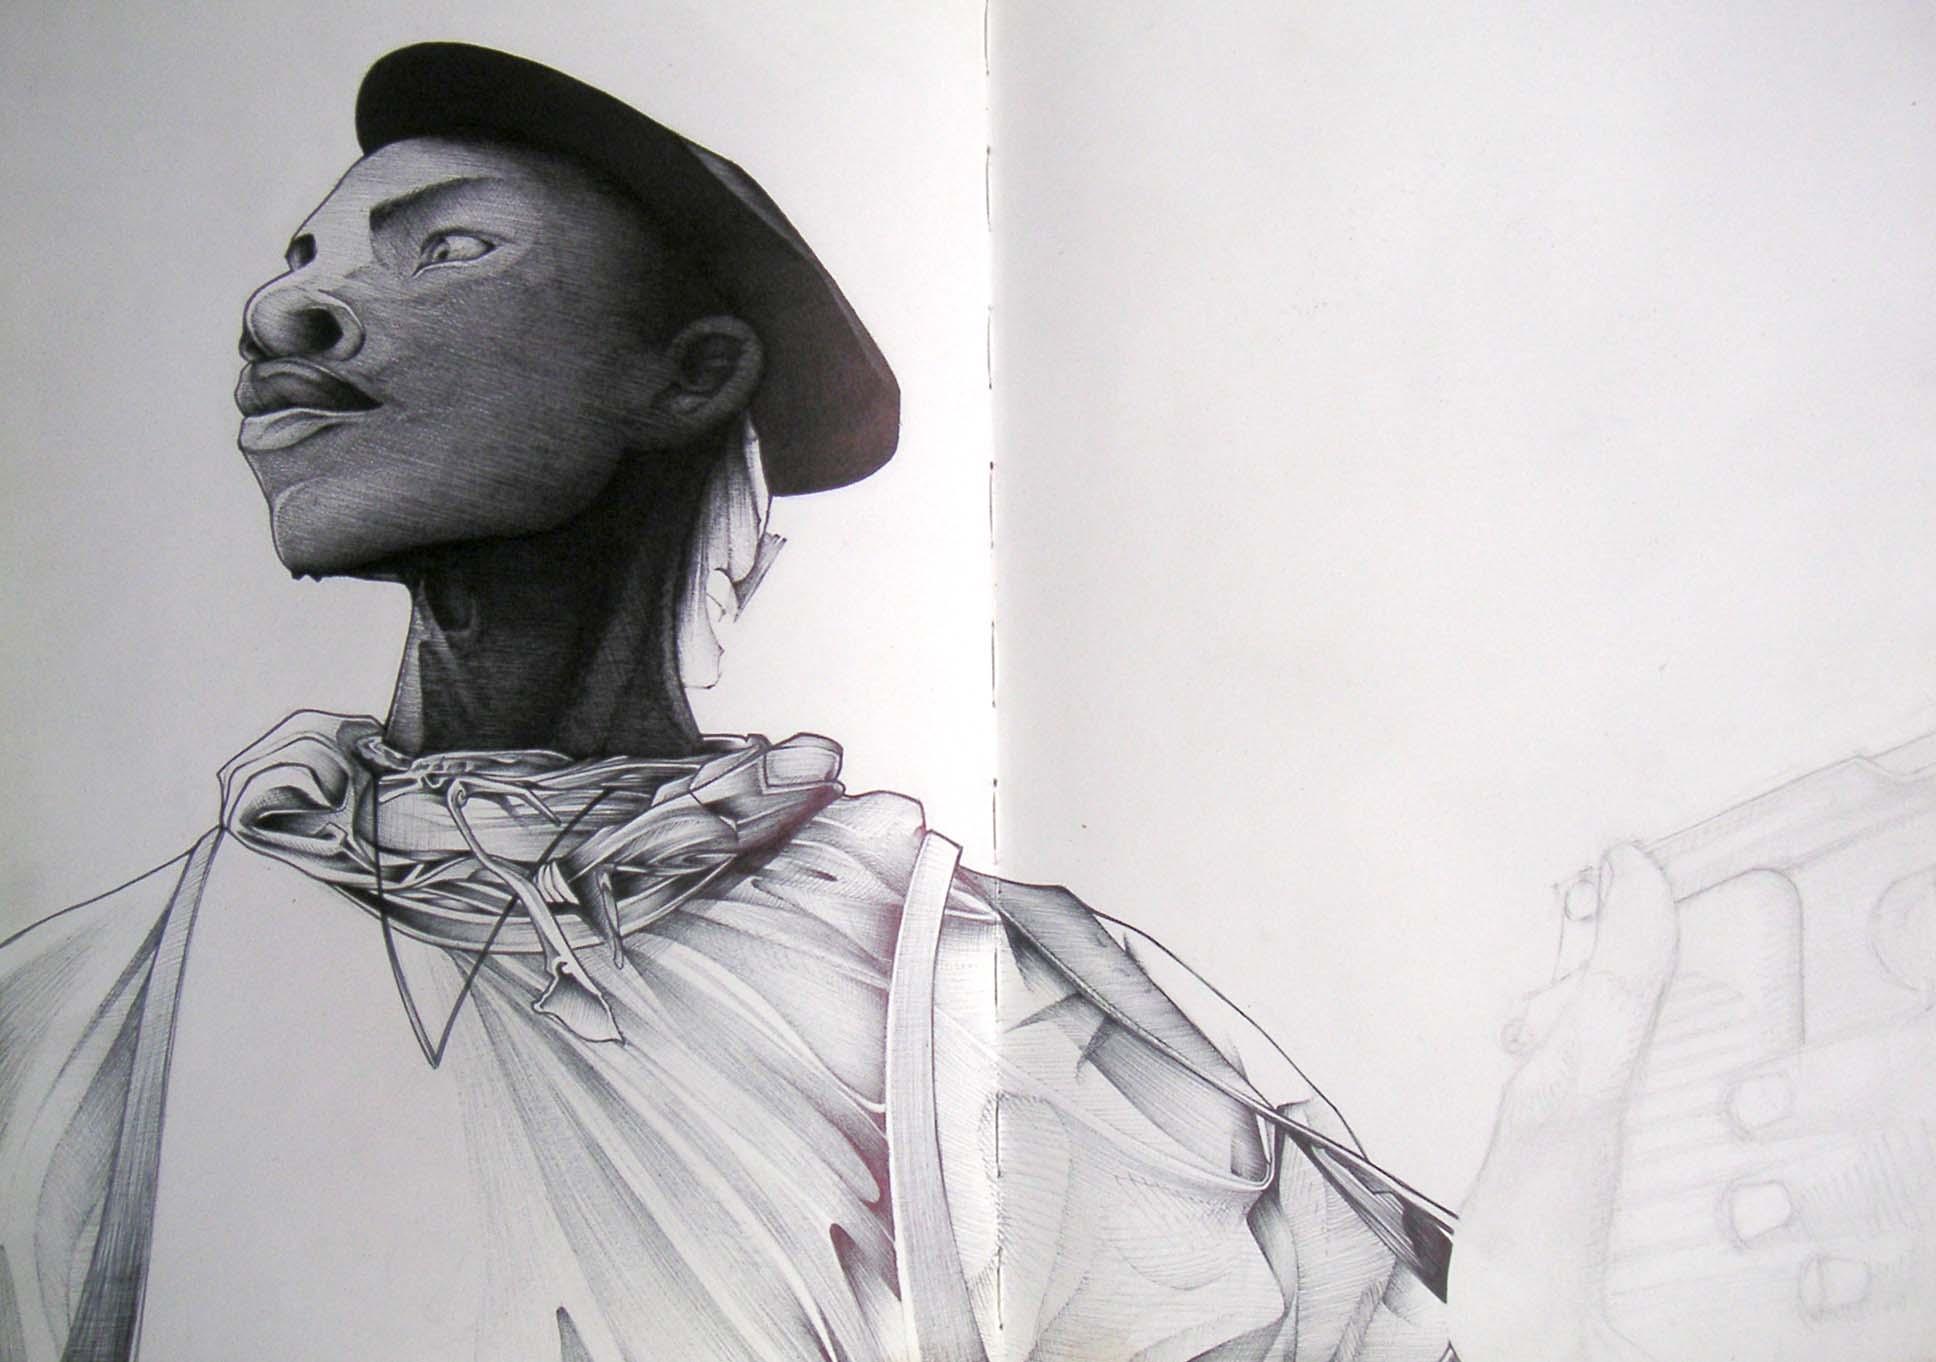 https://www.propaganza.be/wp-content/uploads/2019/04/Task-propaganza-urban-artist-graffiti-graff-street-art-spray-painting-belgique-1.jpg